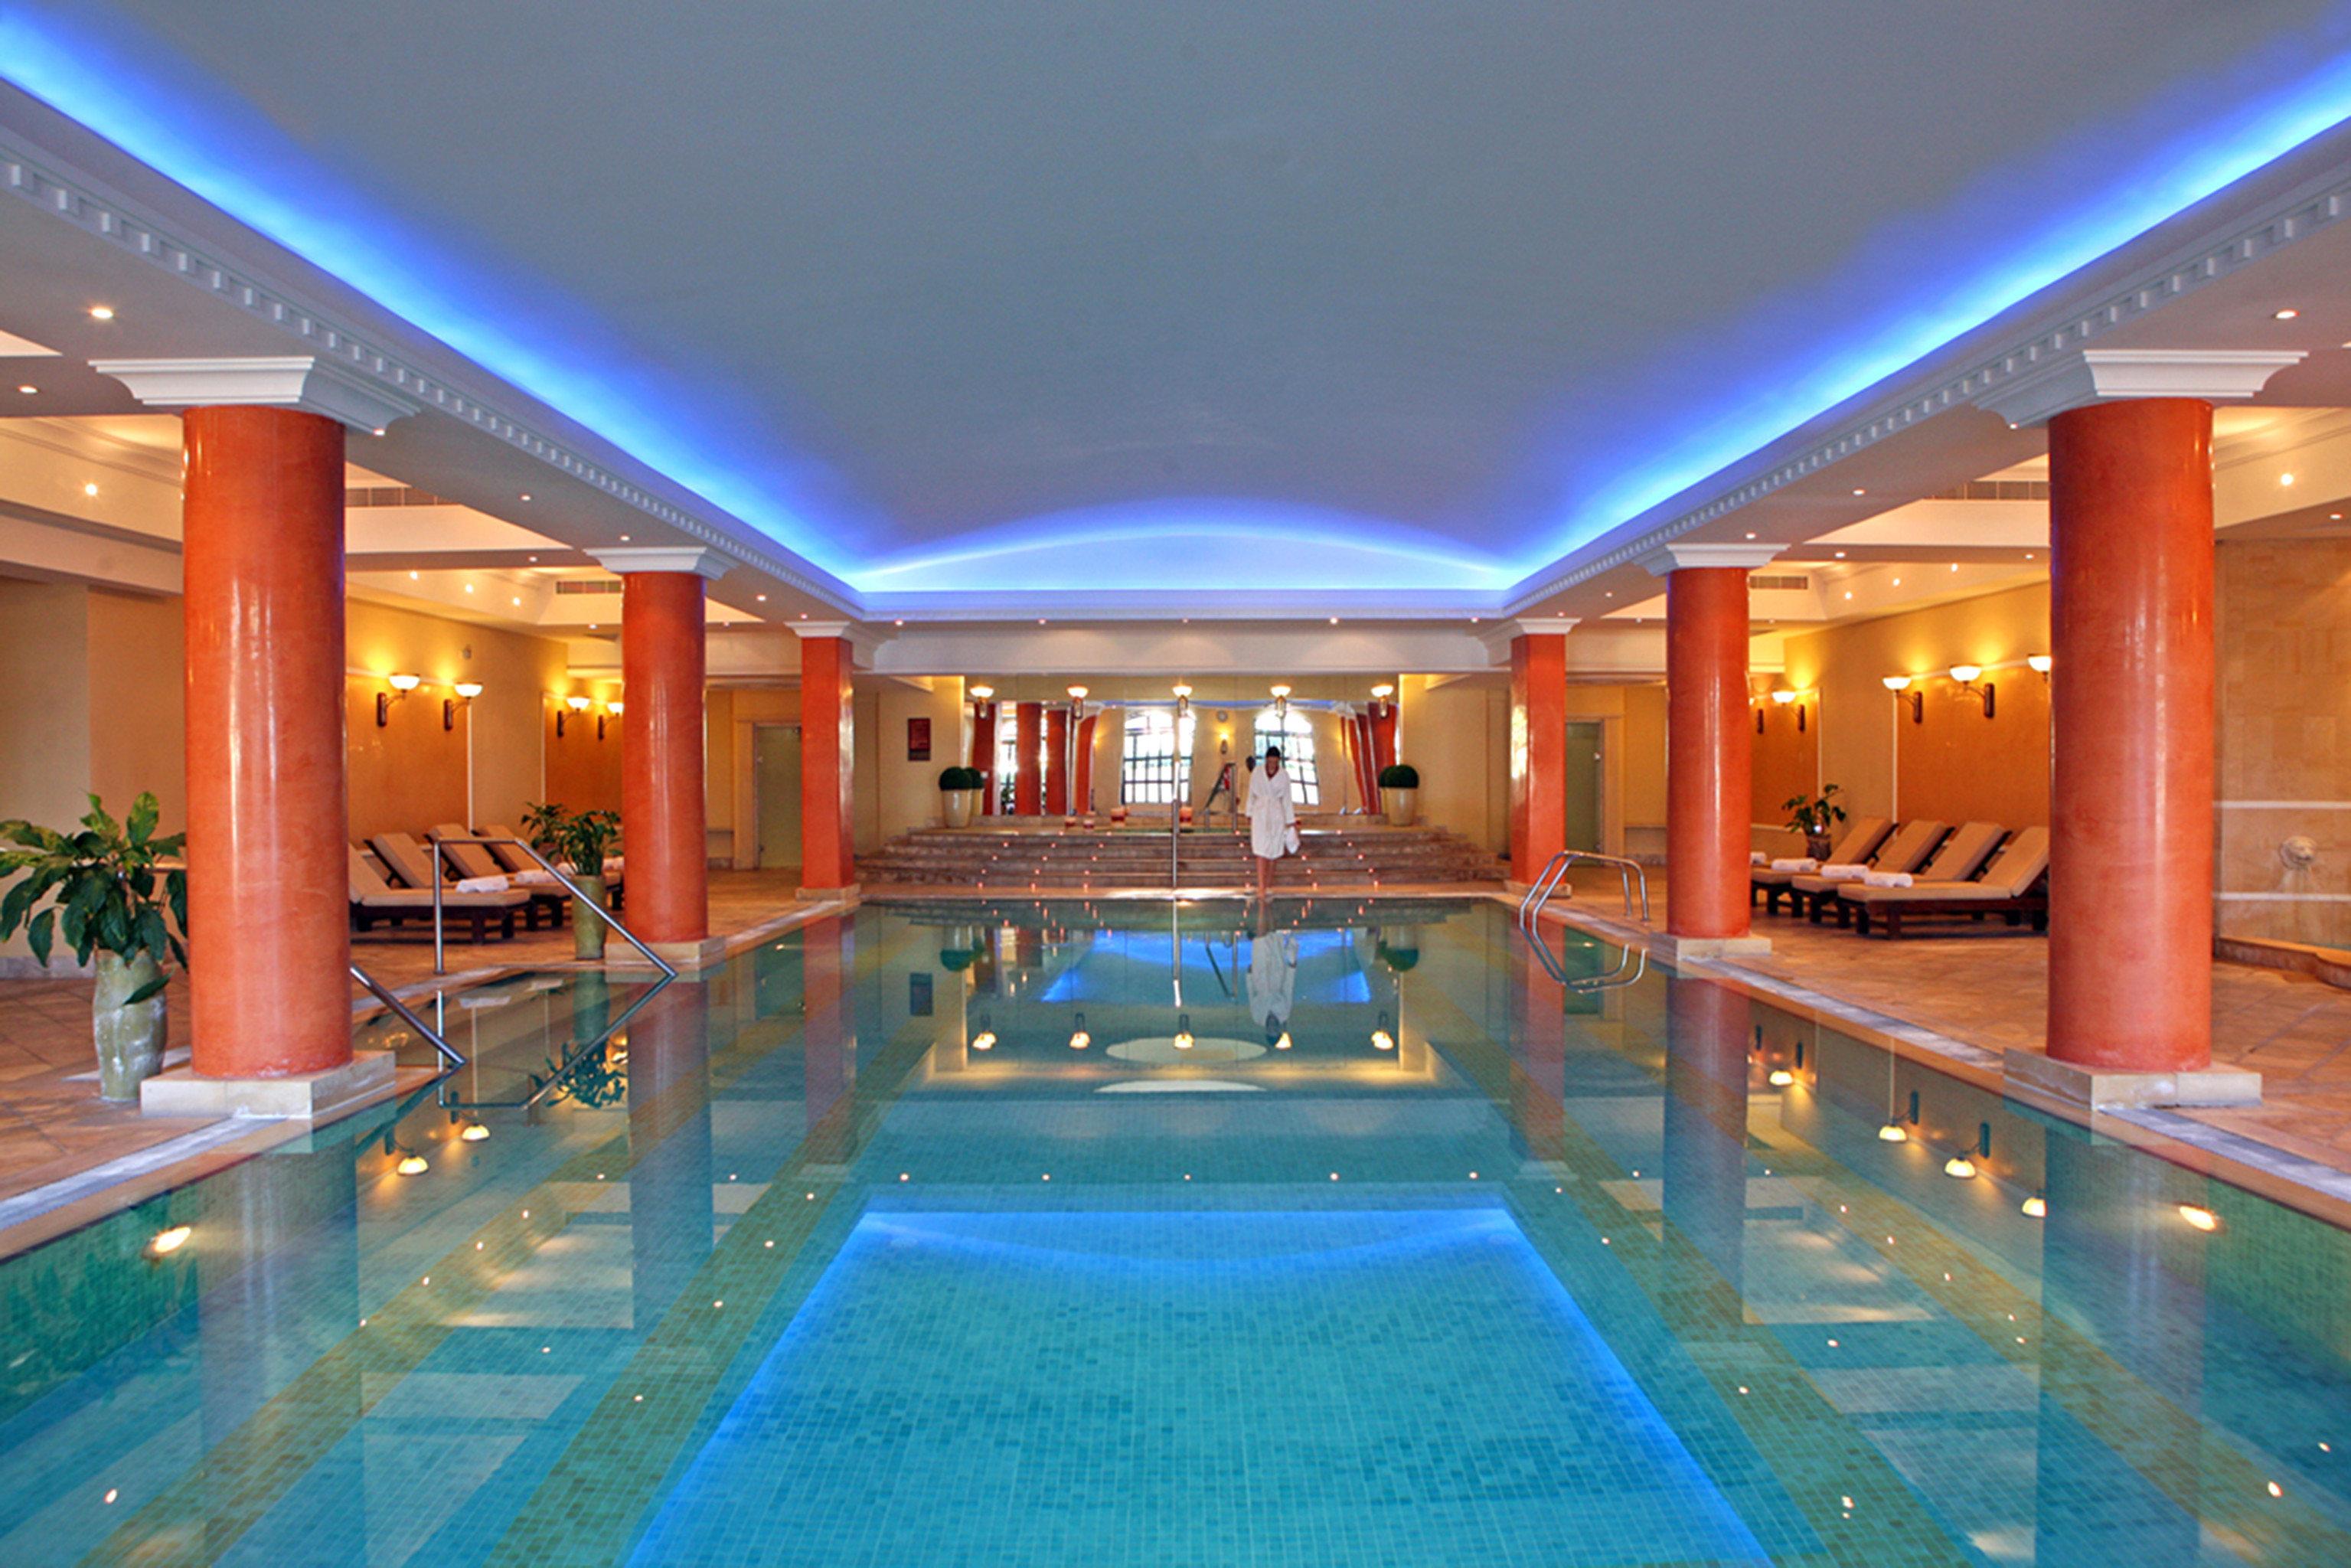 Hip Lounge Luxury Modern Pool swimming pool Resort leisure leisure centre billiard room blue